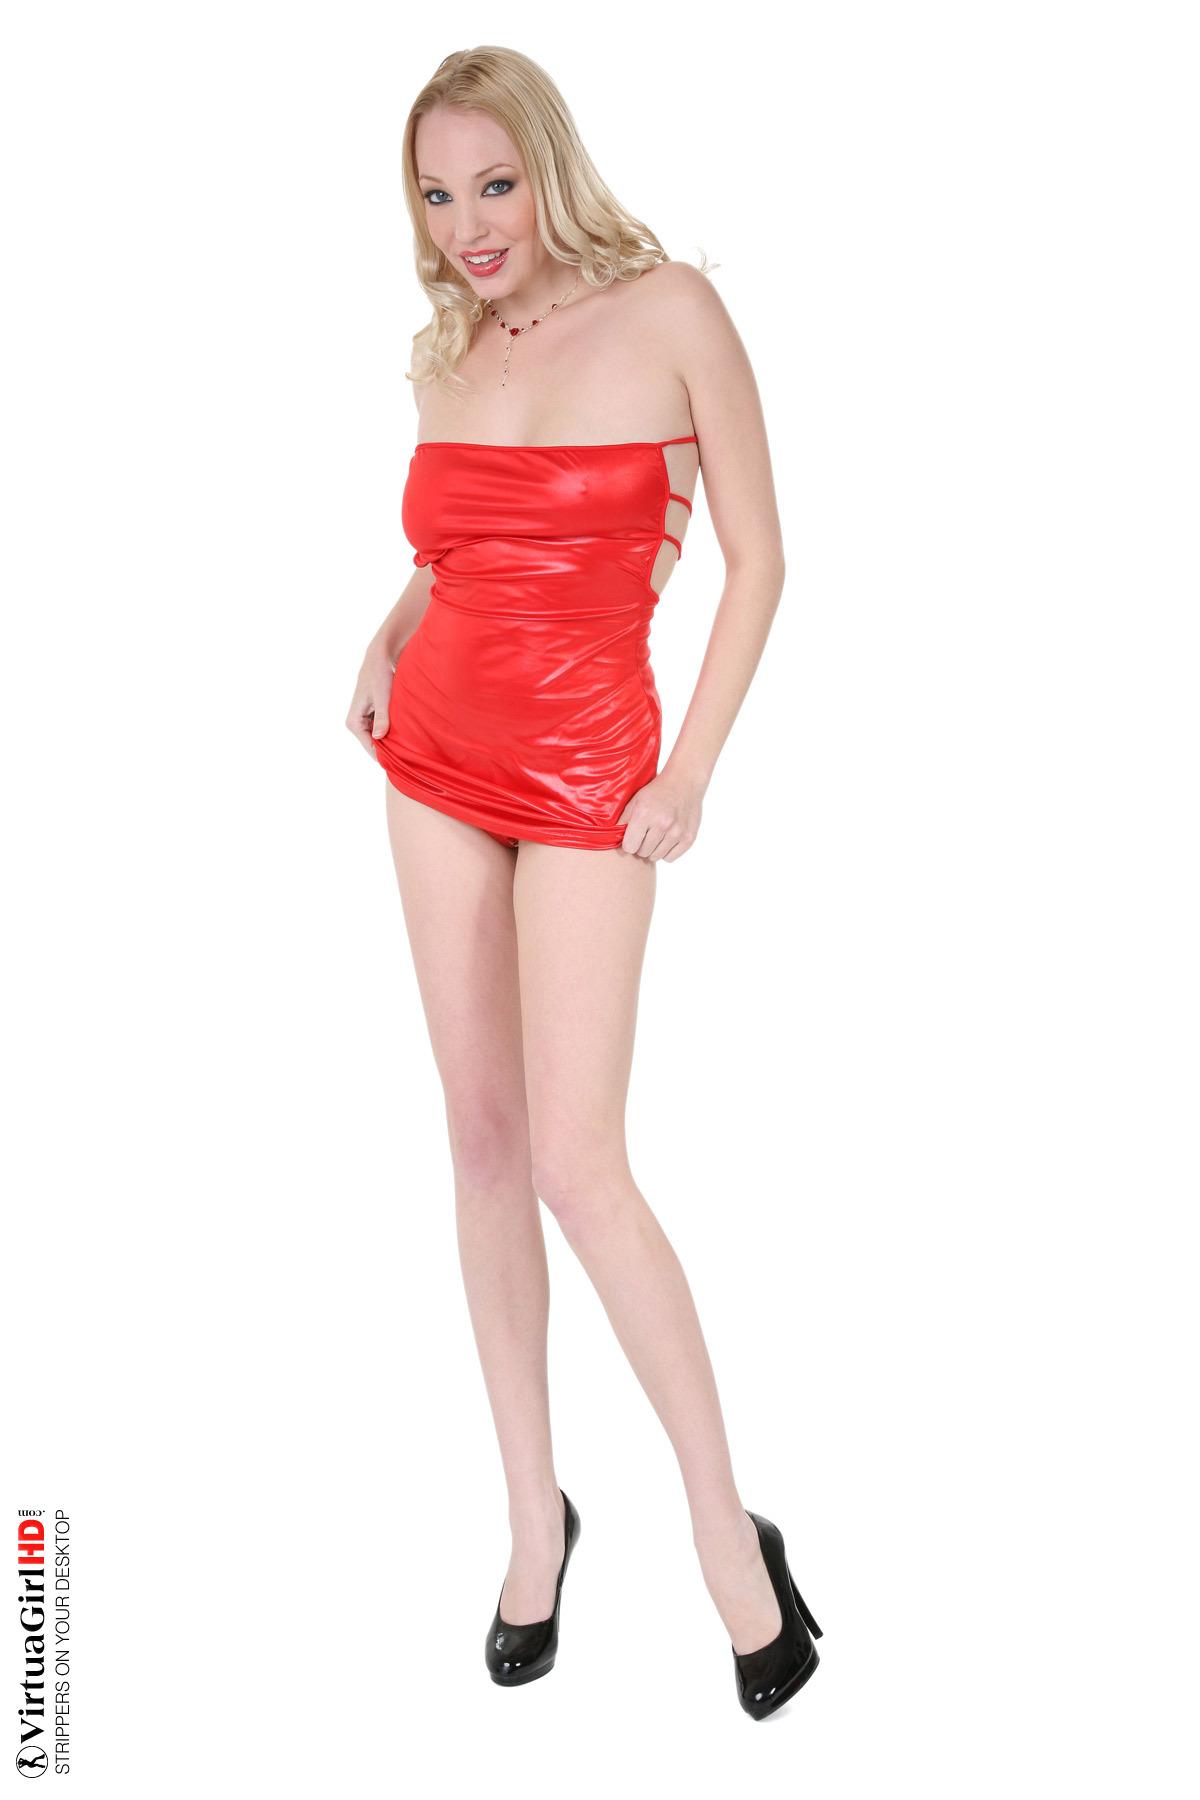 hot girls webcam stripping